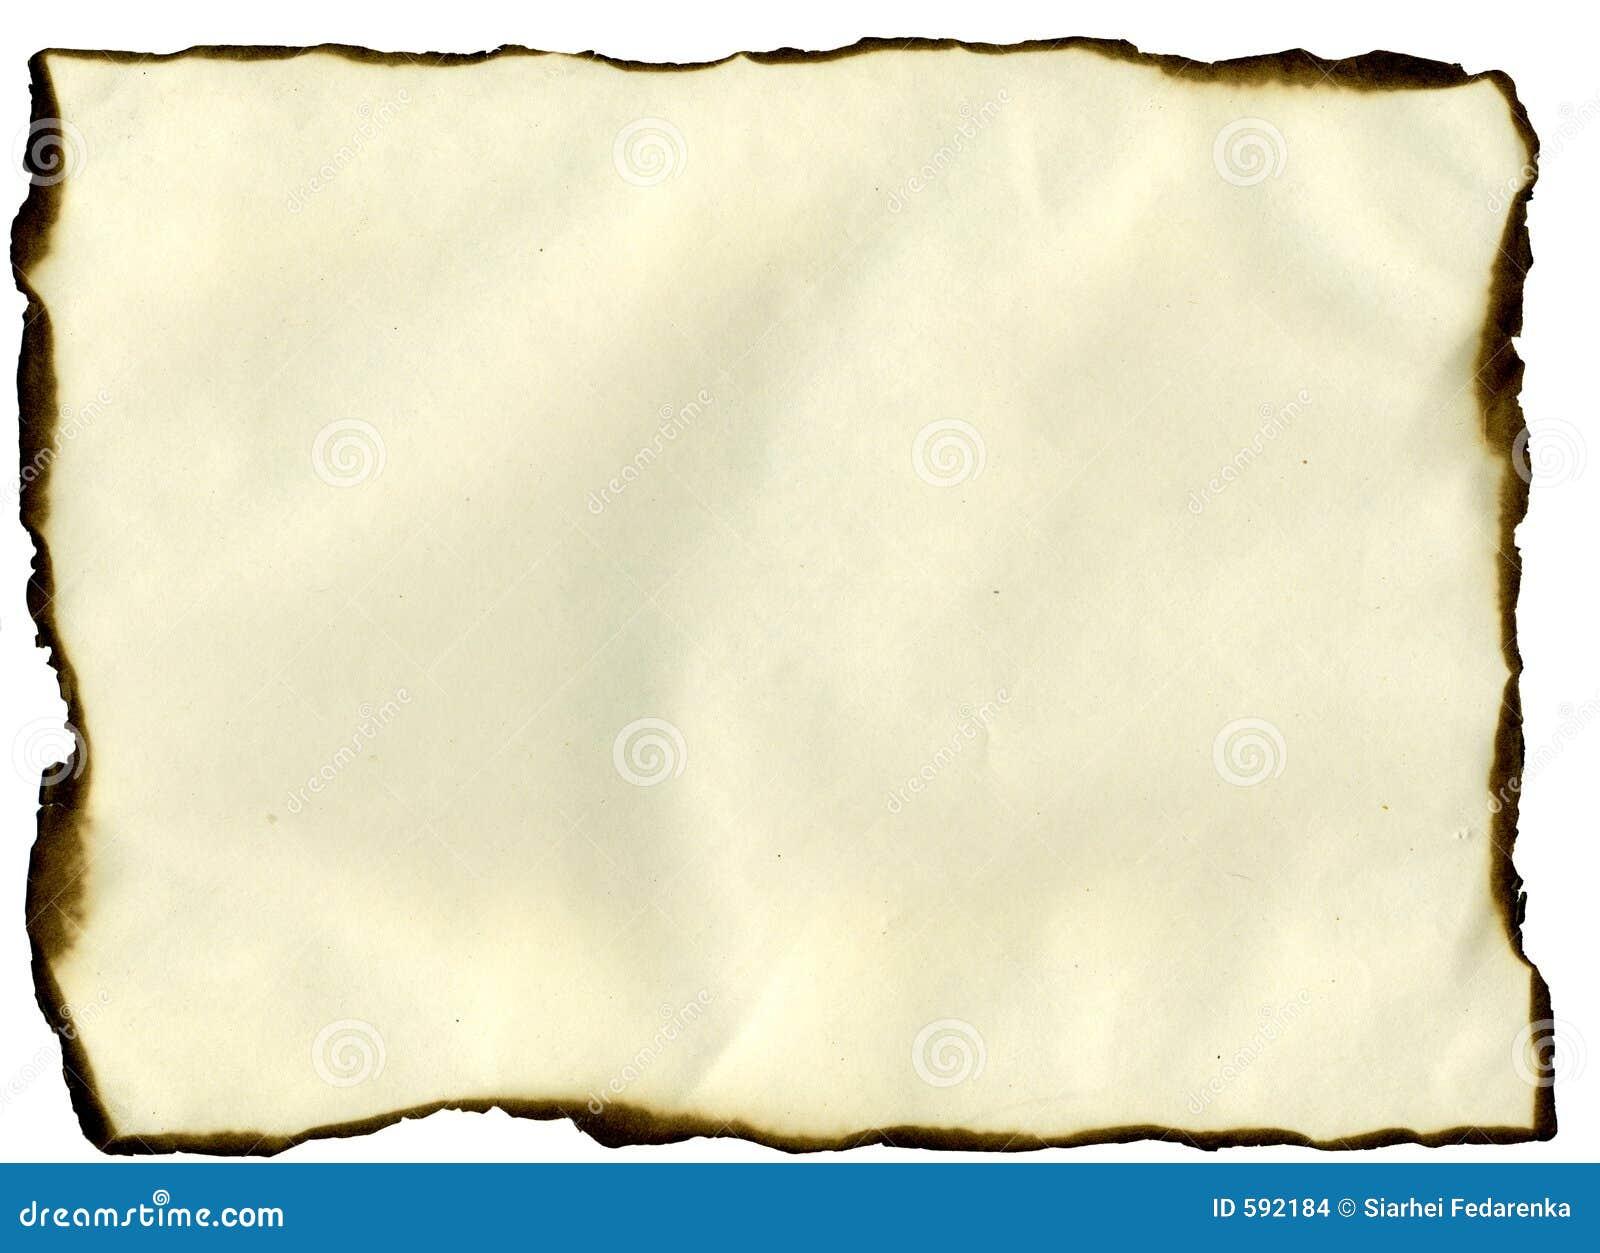 Sheet With Burned Edges Stock Images - Image: 592184